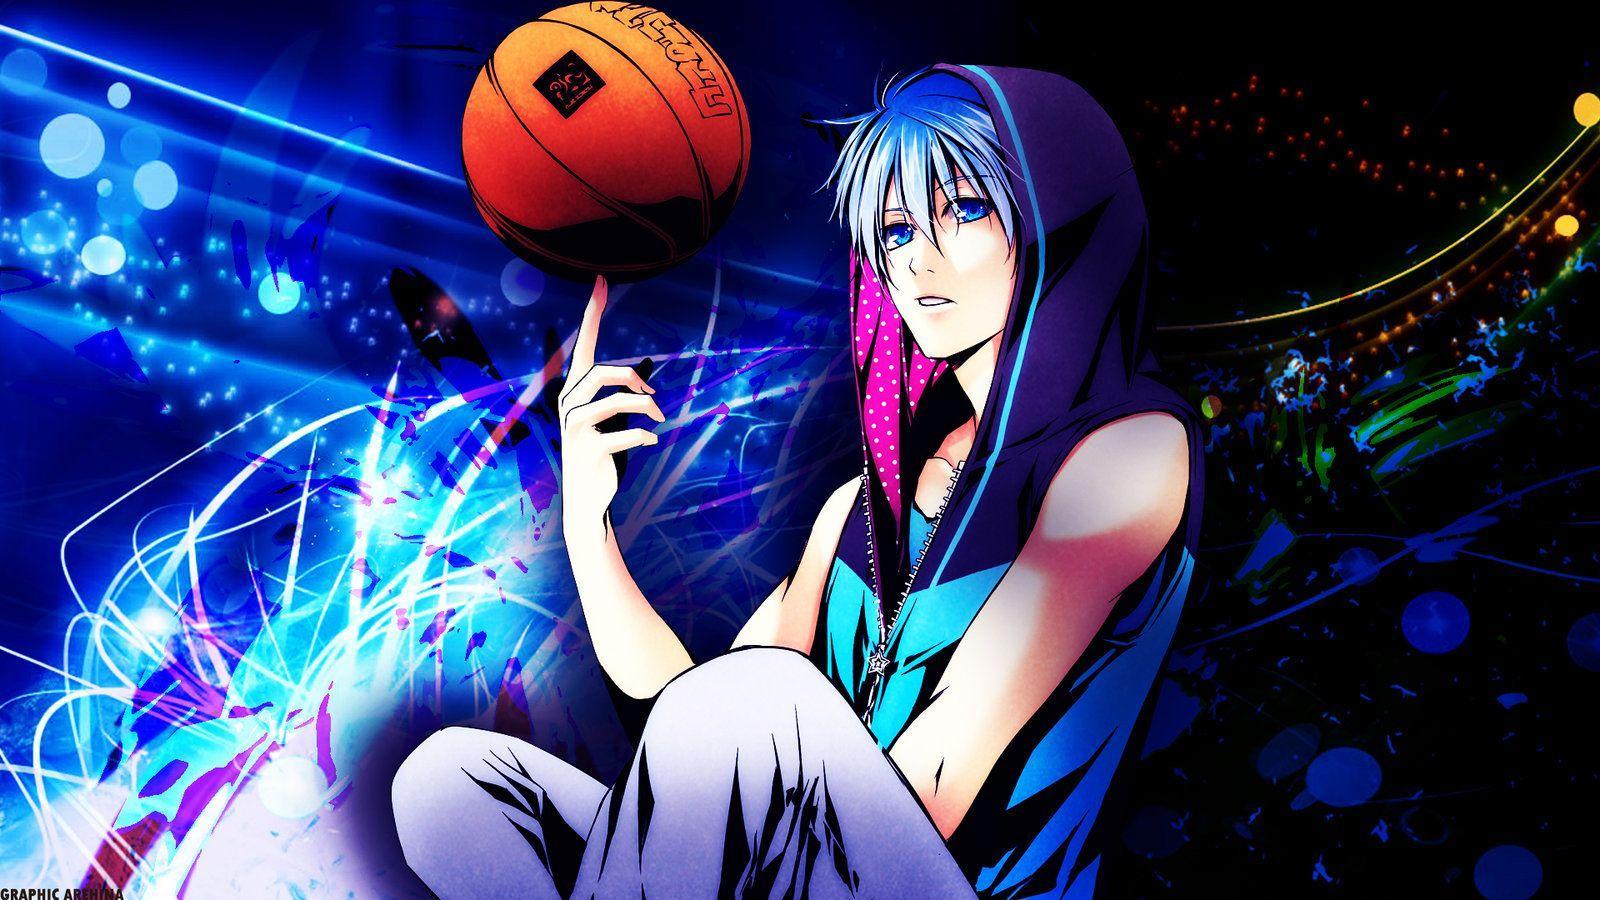 Download 200+ Wallpaper Anime Kuroko Hd Android HD Paling Keren